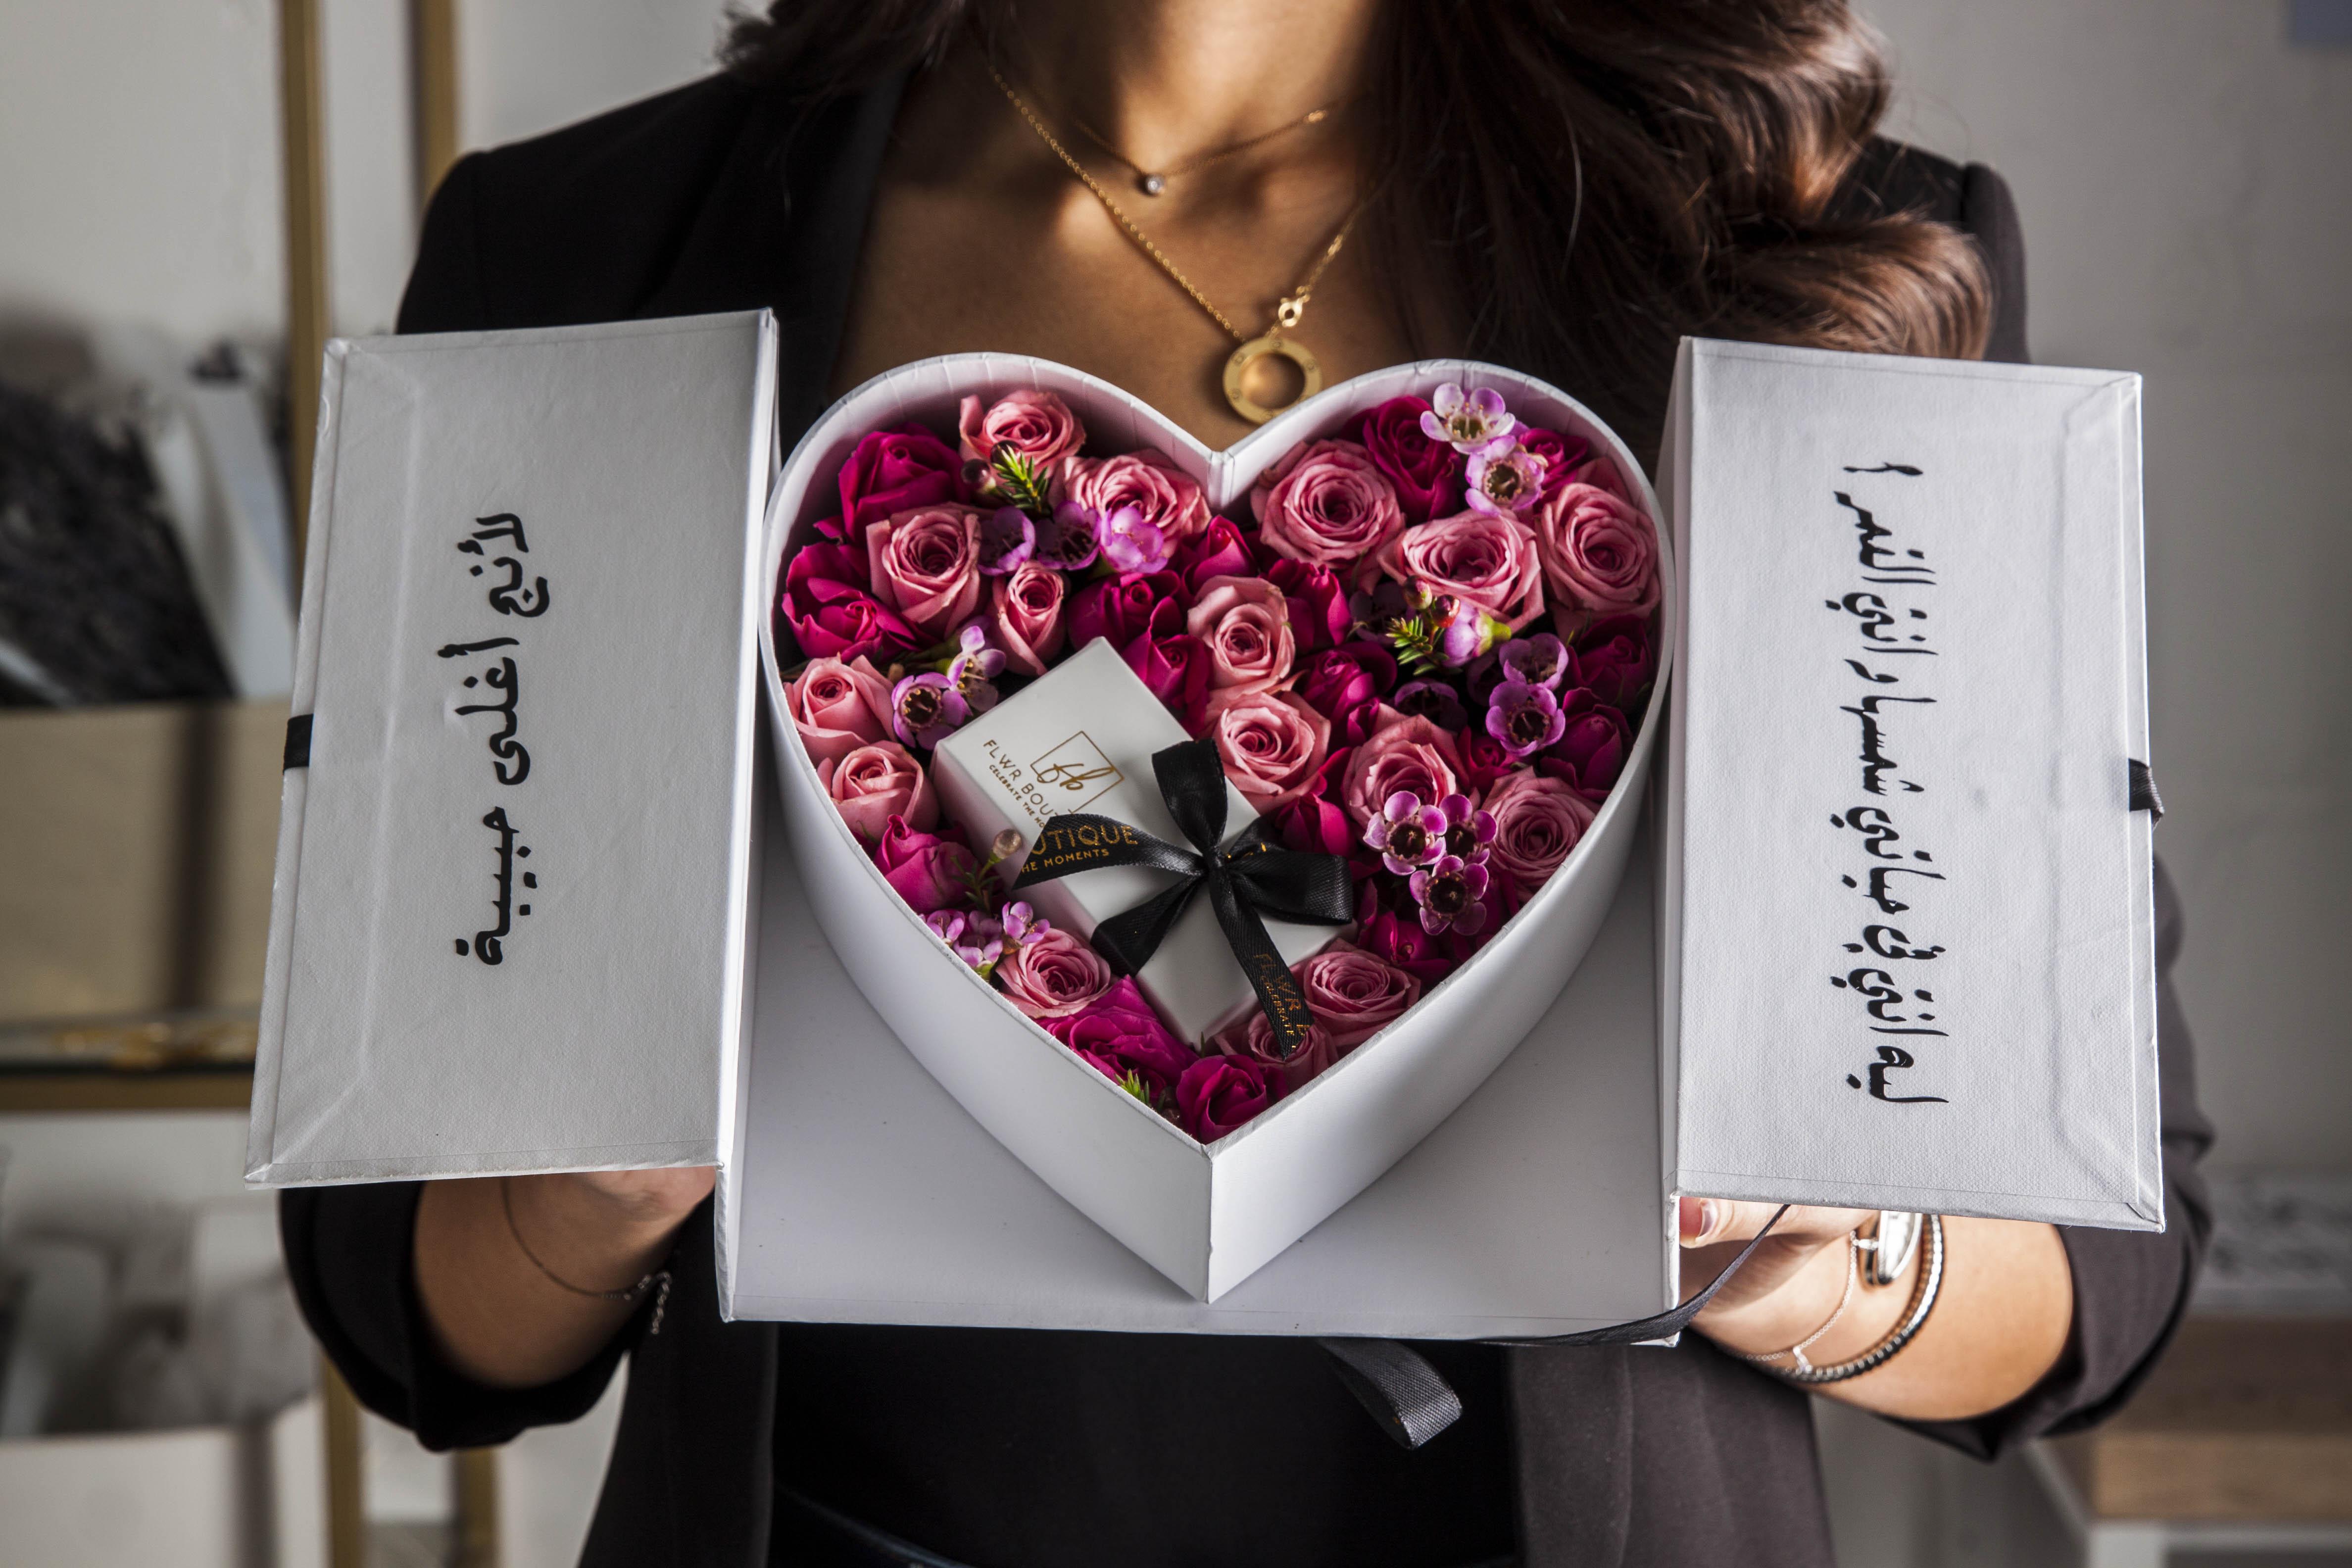 Aghla Habiba Box - Chocolate 'الحب الأحمر باقة زهور